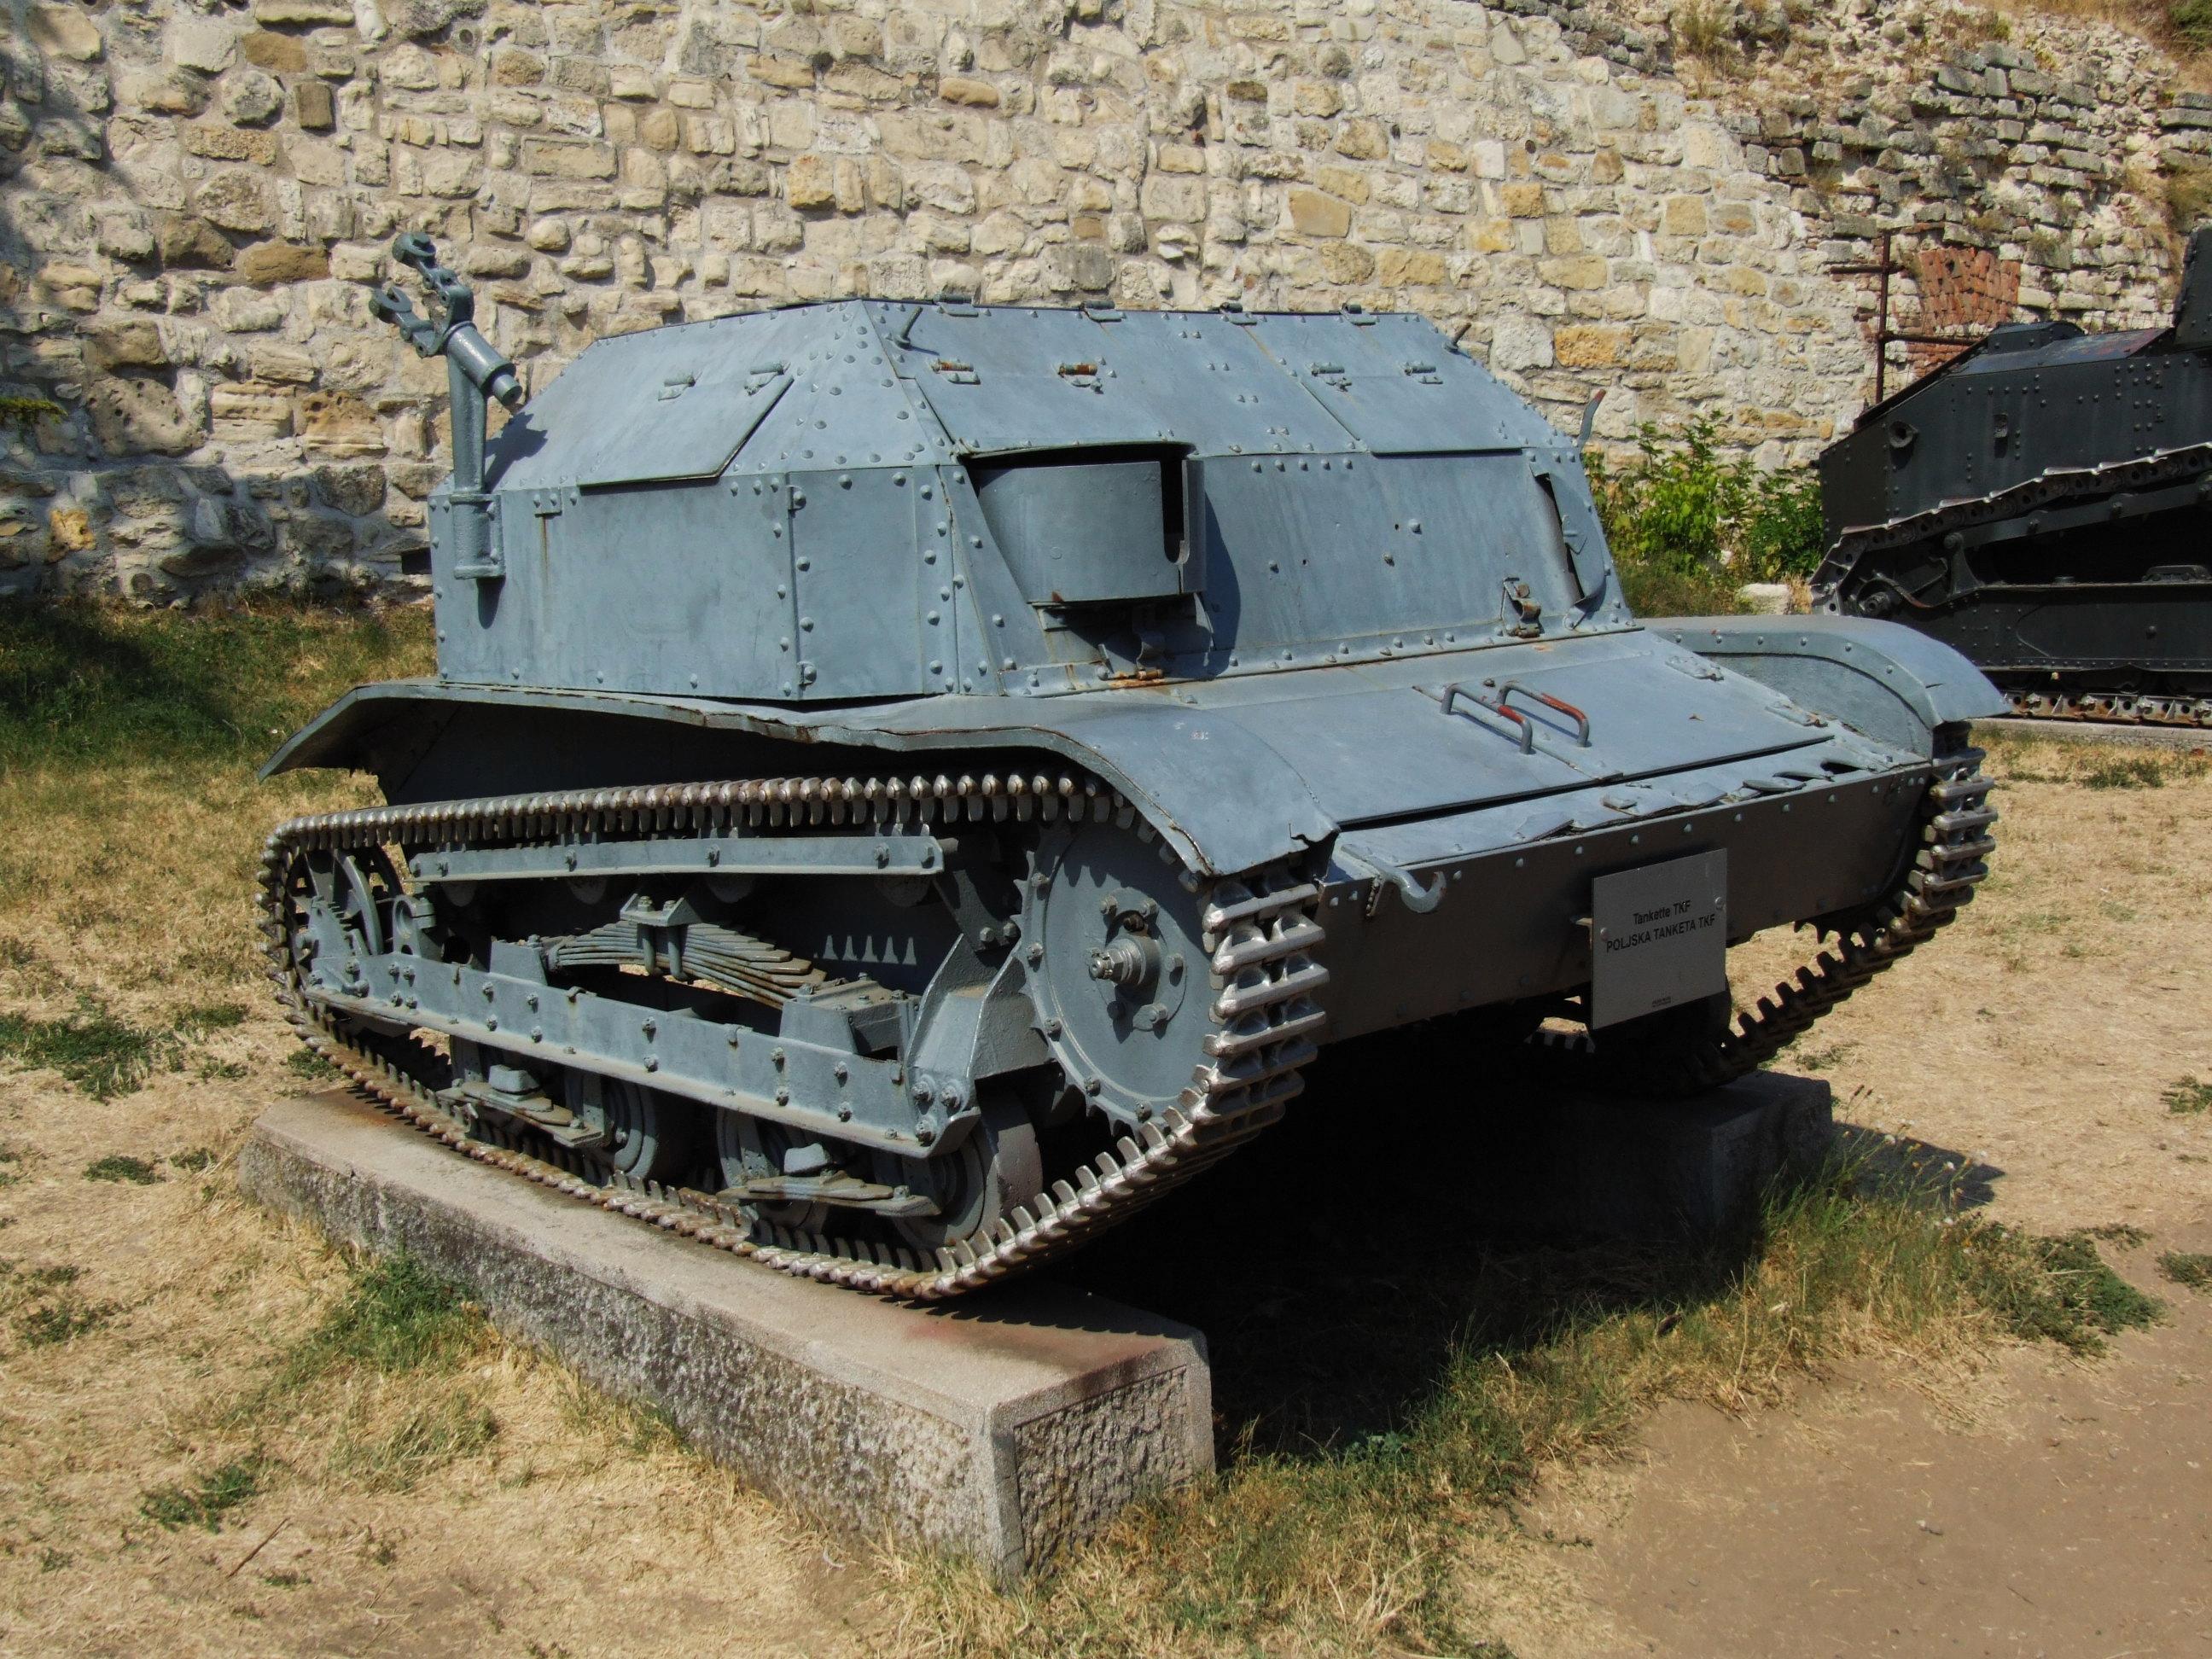 Belgrade_Military_Museum_-_TKF_tankette.